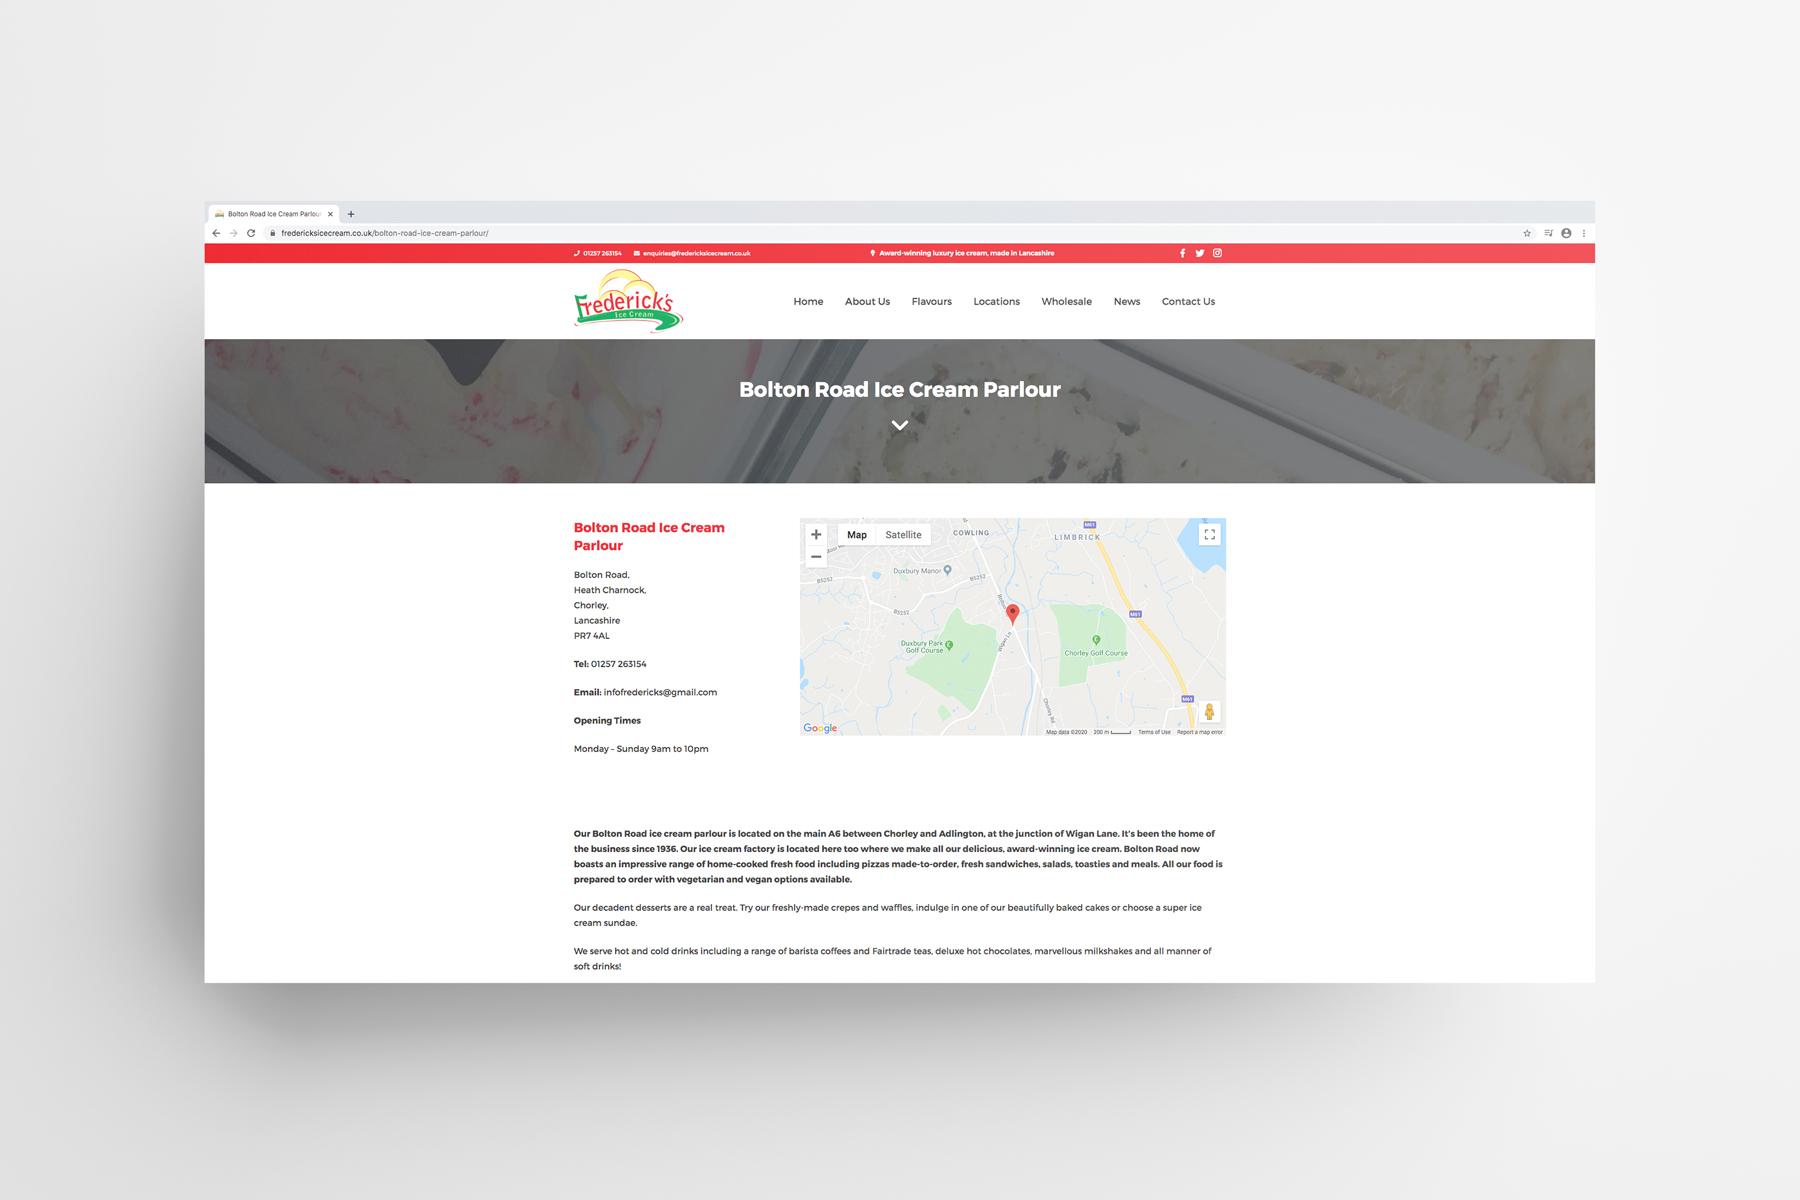 Fredericks Website Design